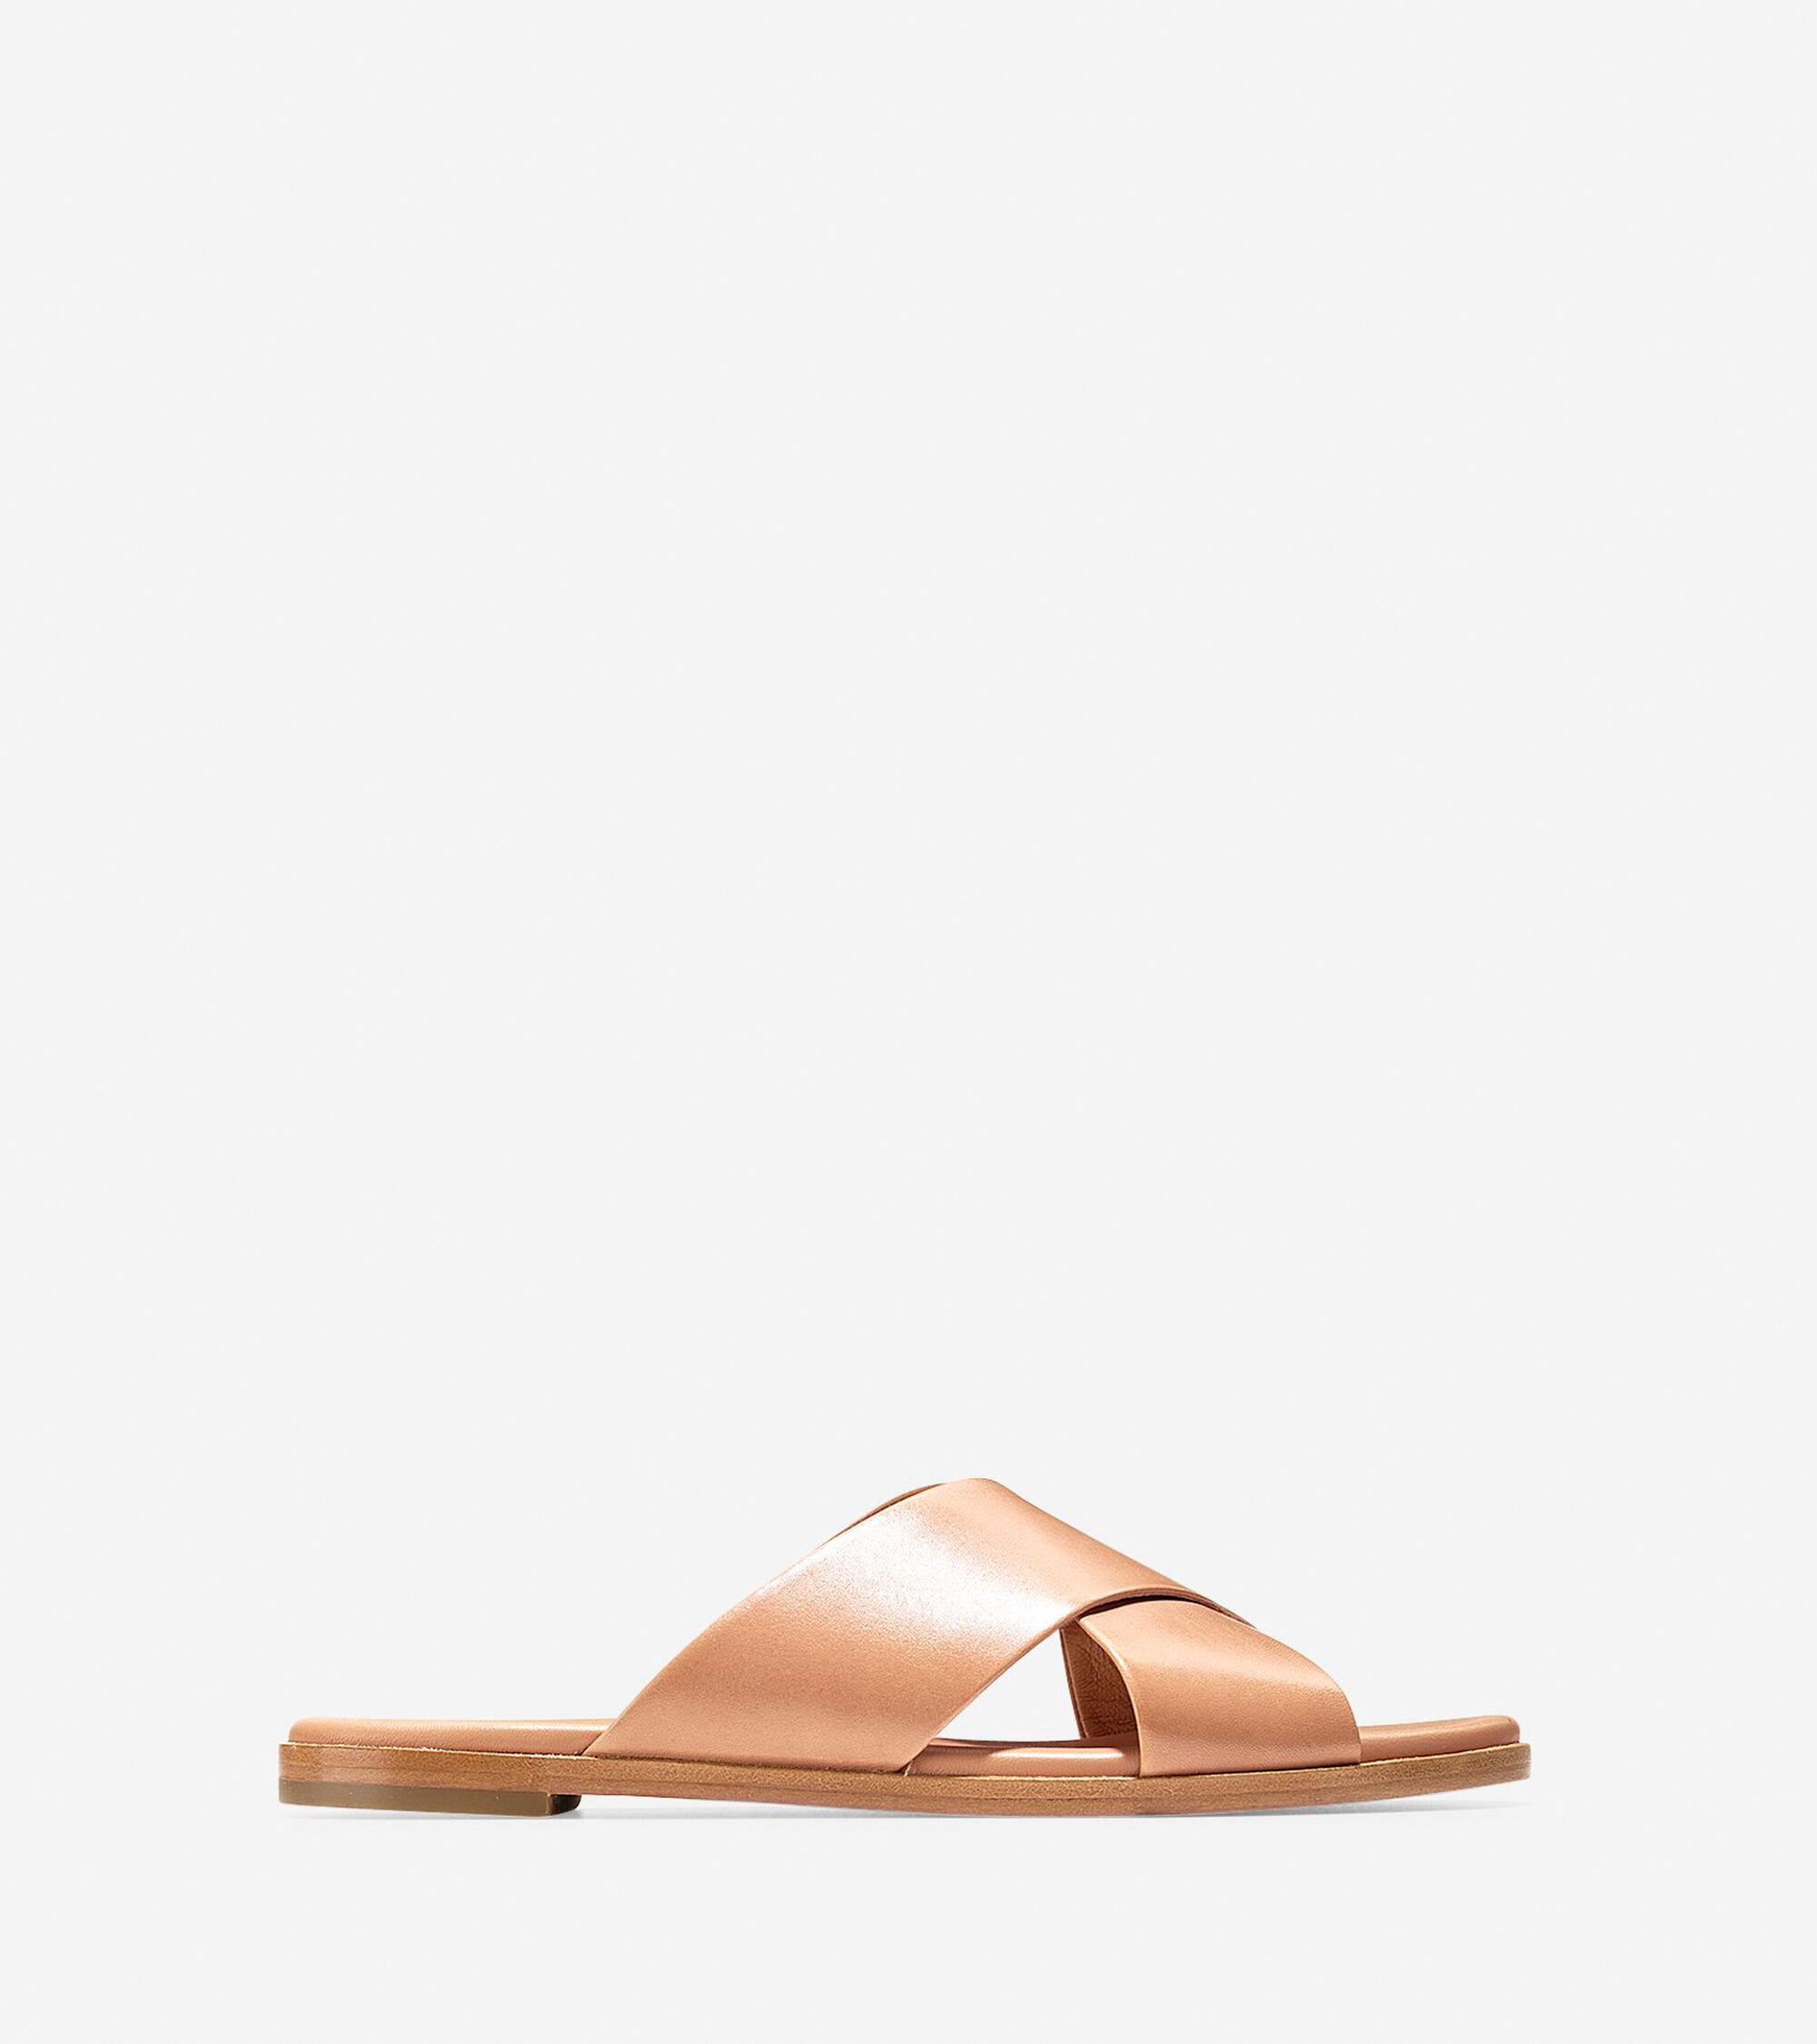 e62075f5994 Anica Criss Cross Sandals in Sahara Leather